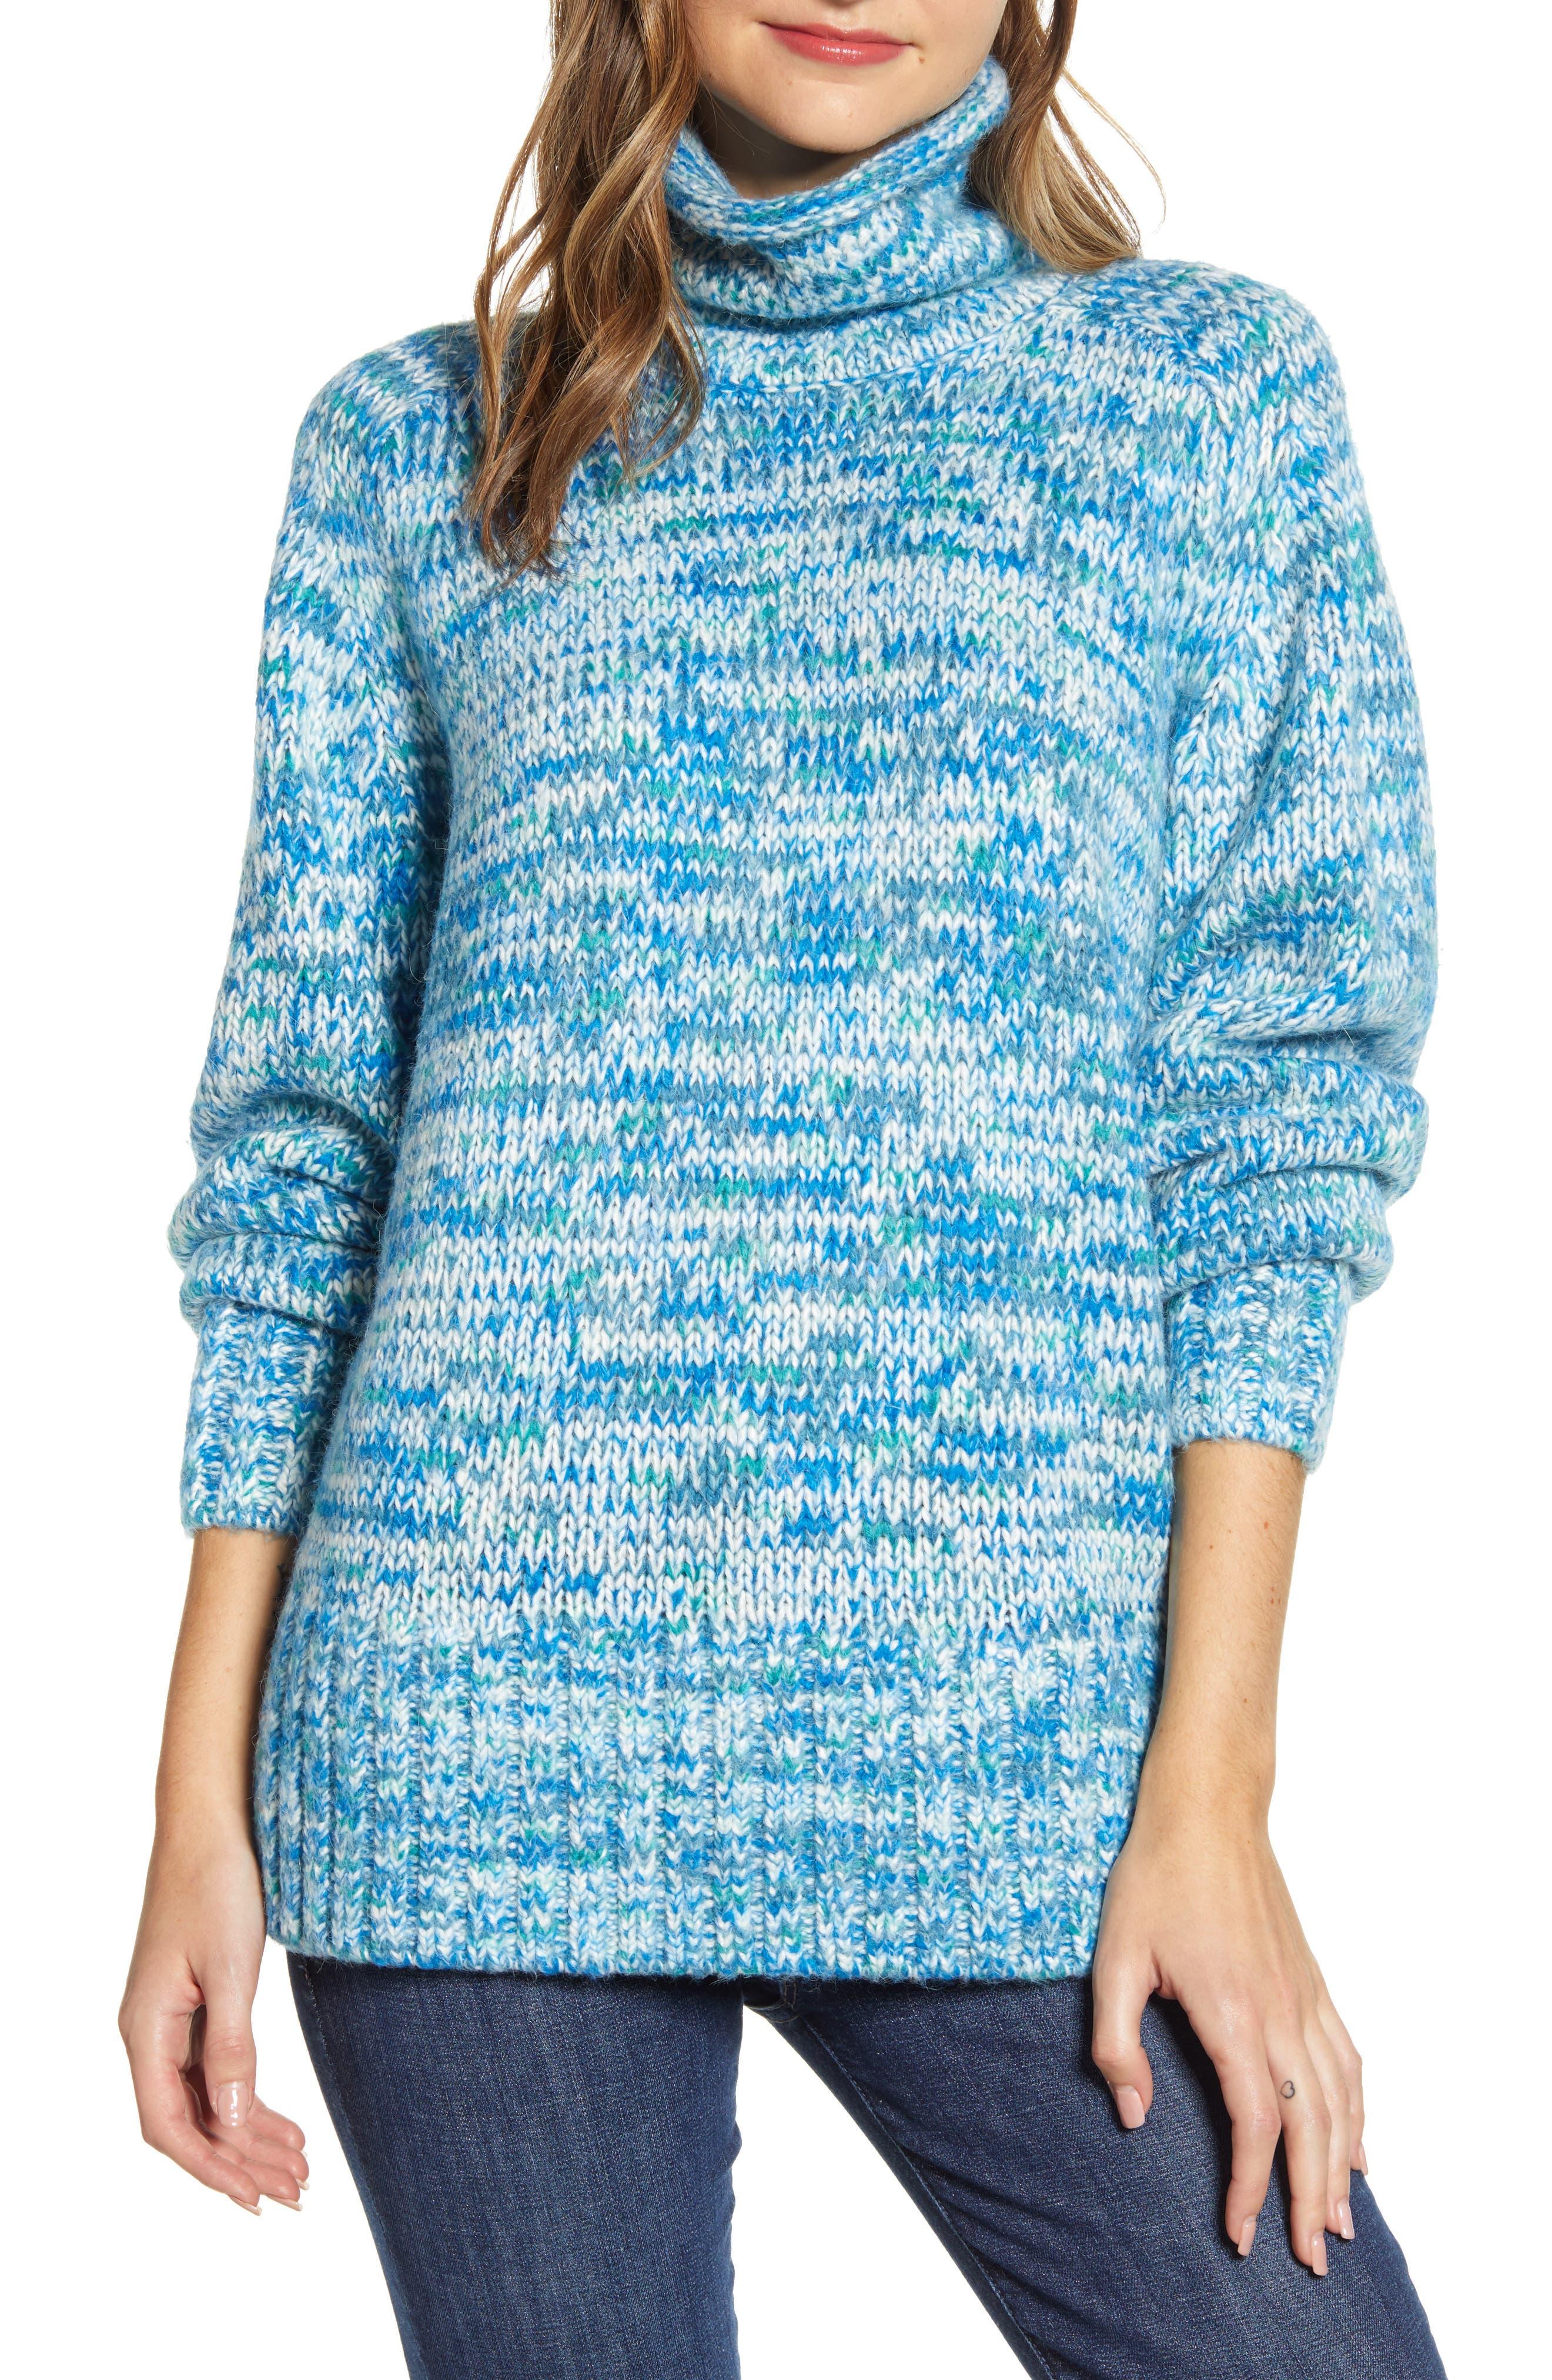 Image of LOU & GREY Findley Space Dye Turtleneck Sweater